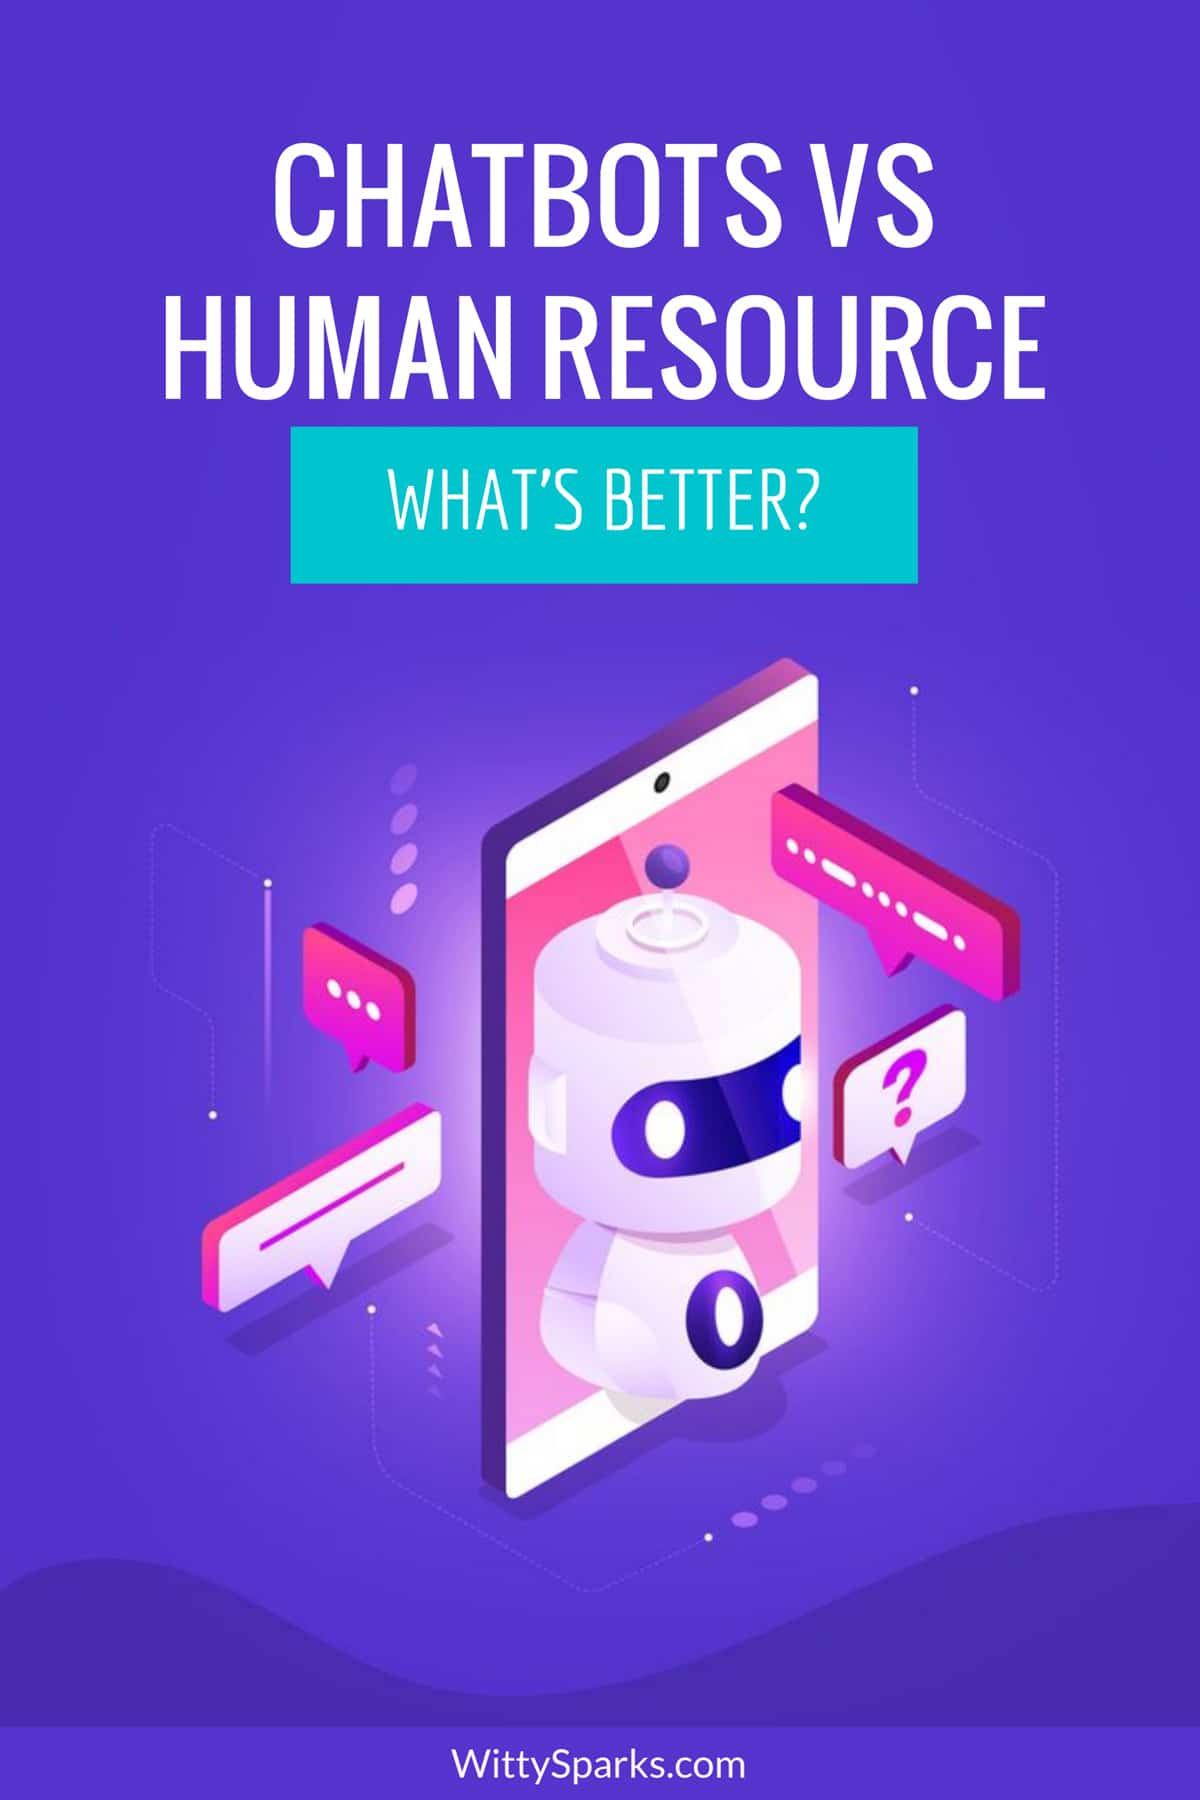 Chatbots vs human resource services